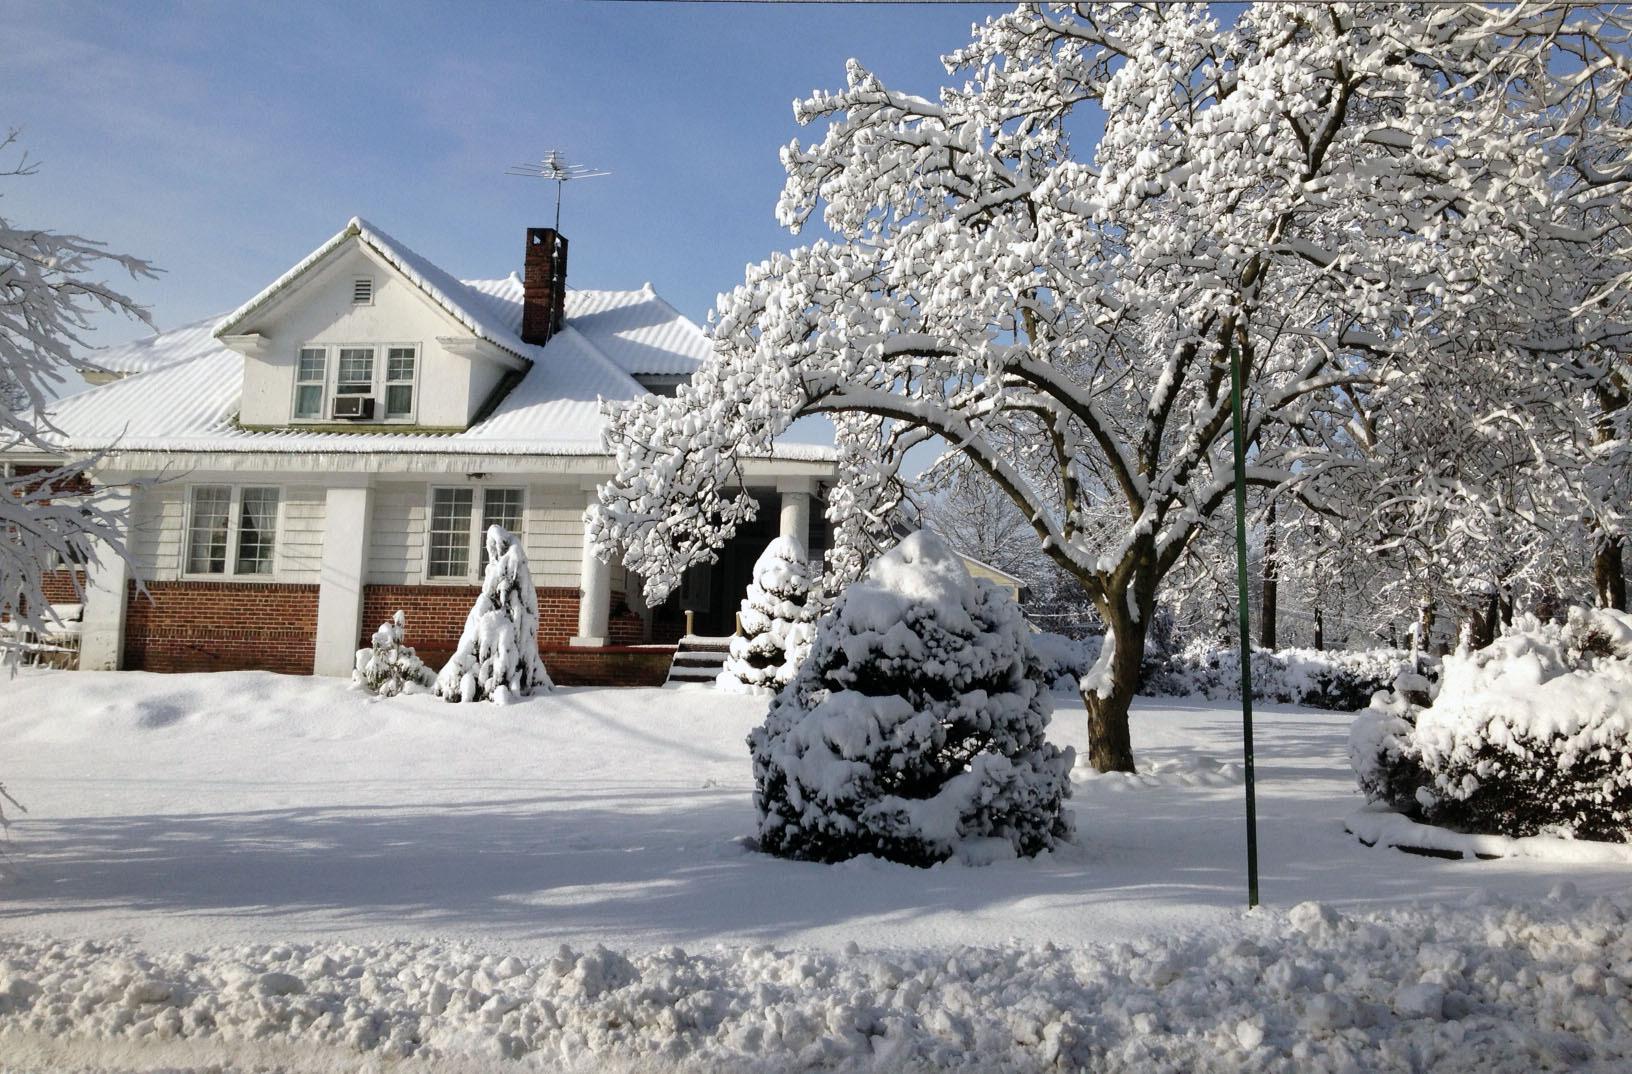 ac3a12483f7f9383f194_Snow_House_2.jpg